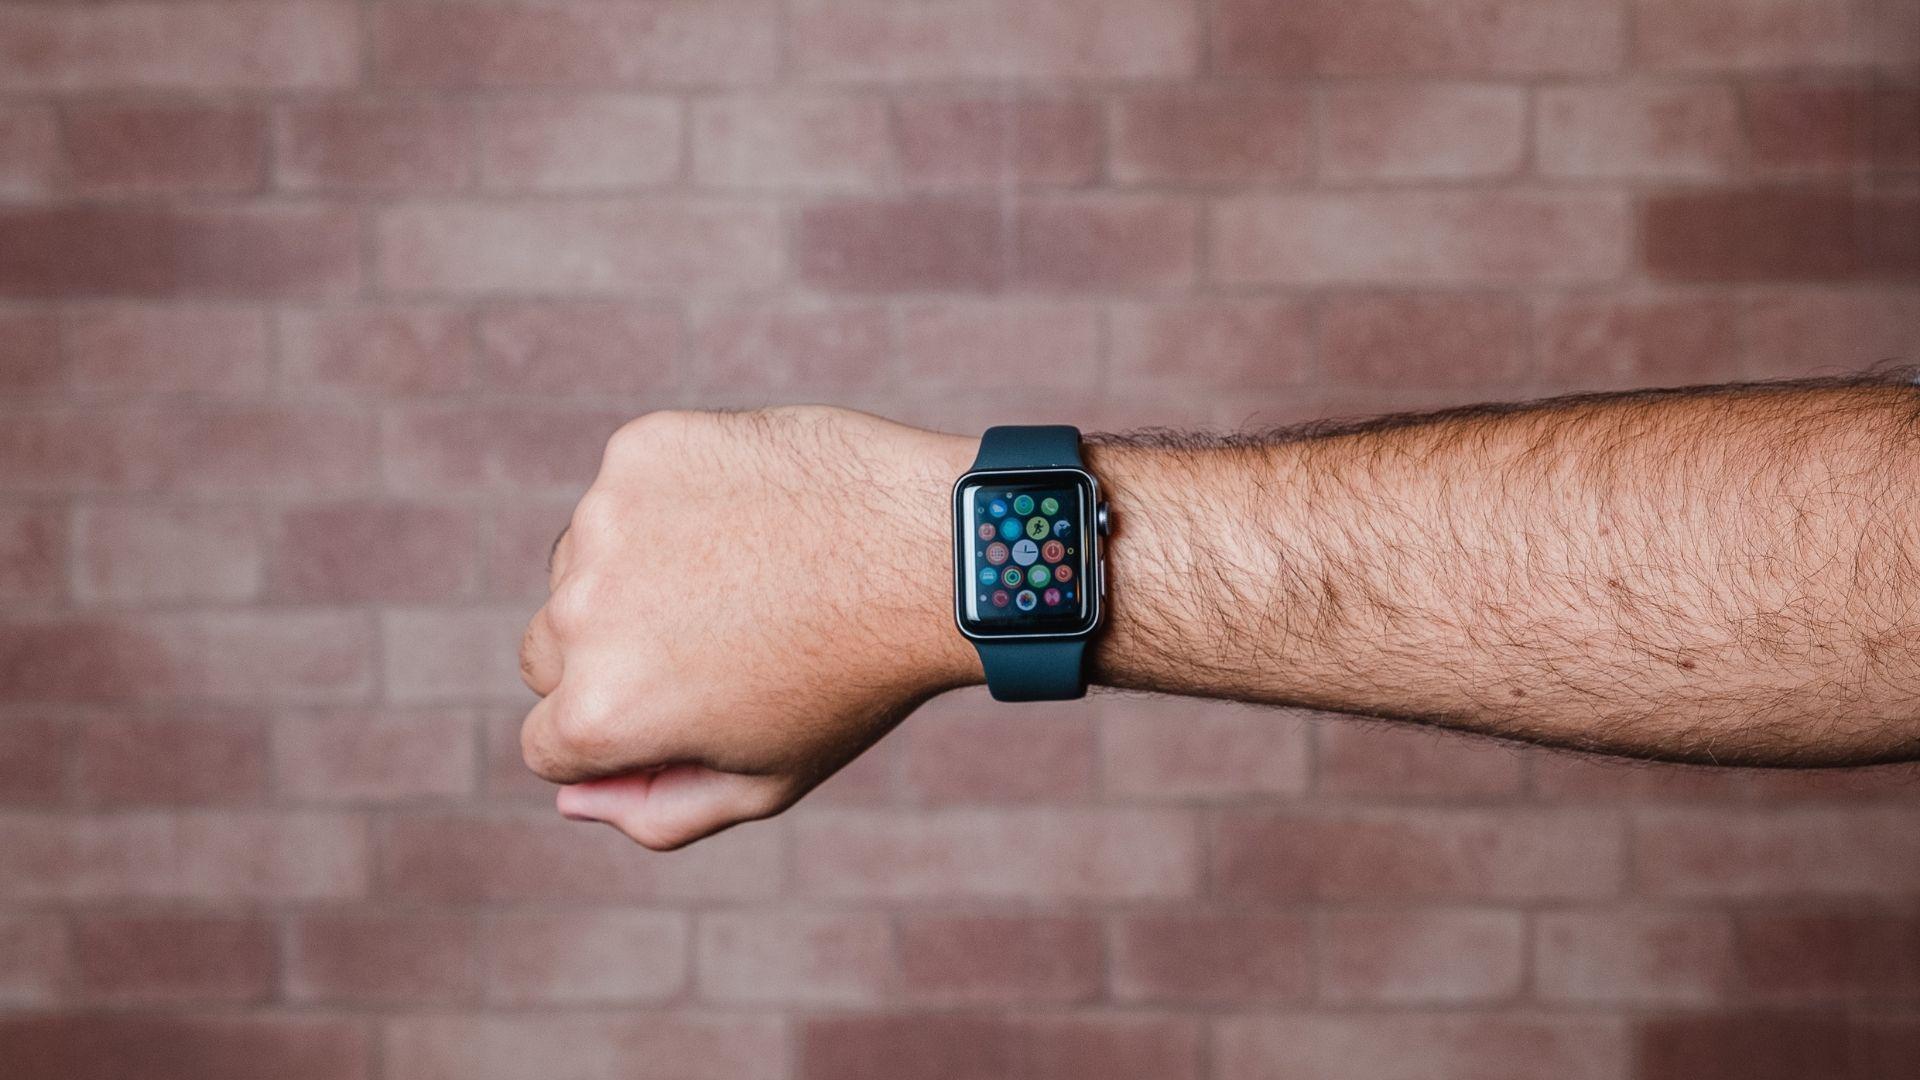 Apple Watch Series 3 roda sistema watchOS e oferece recursos fitness e de saúde (Foto: Zoom)